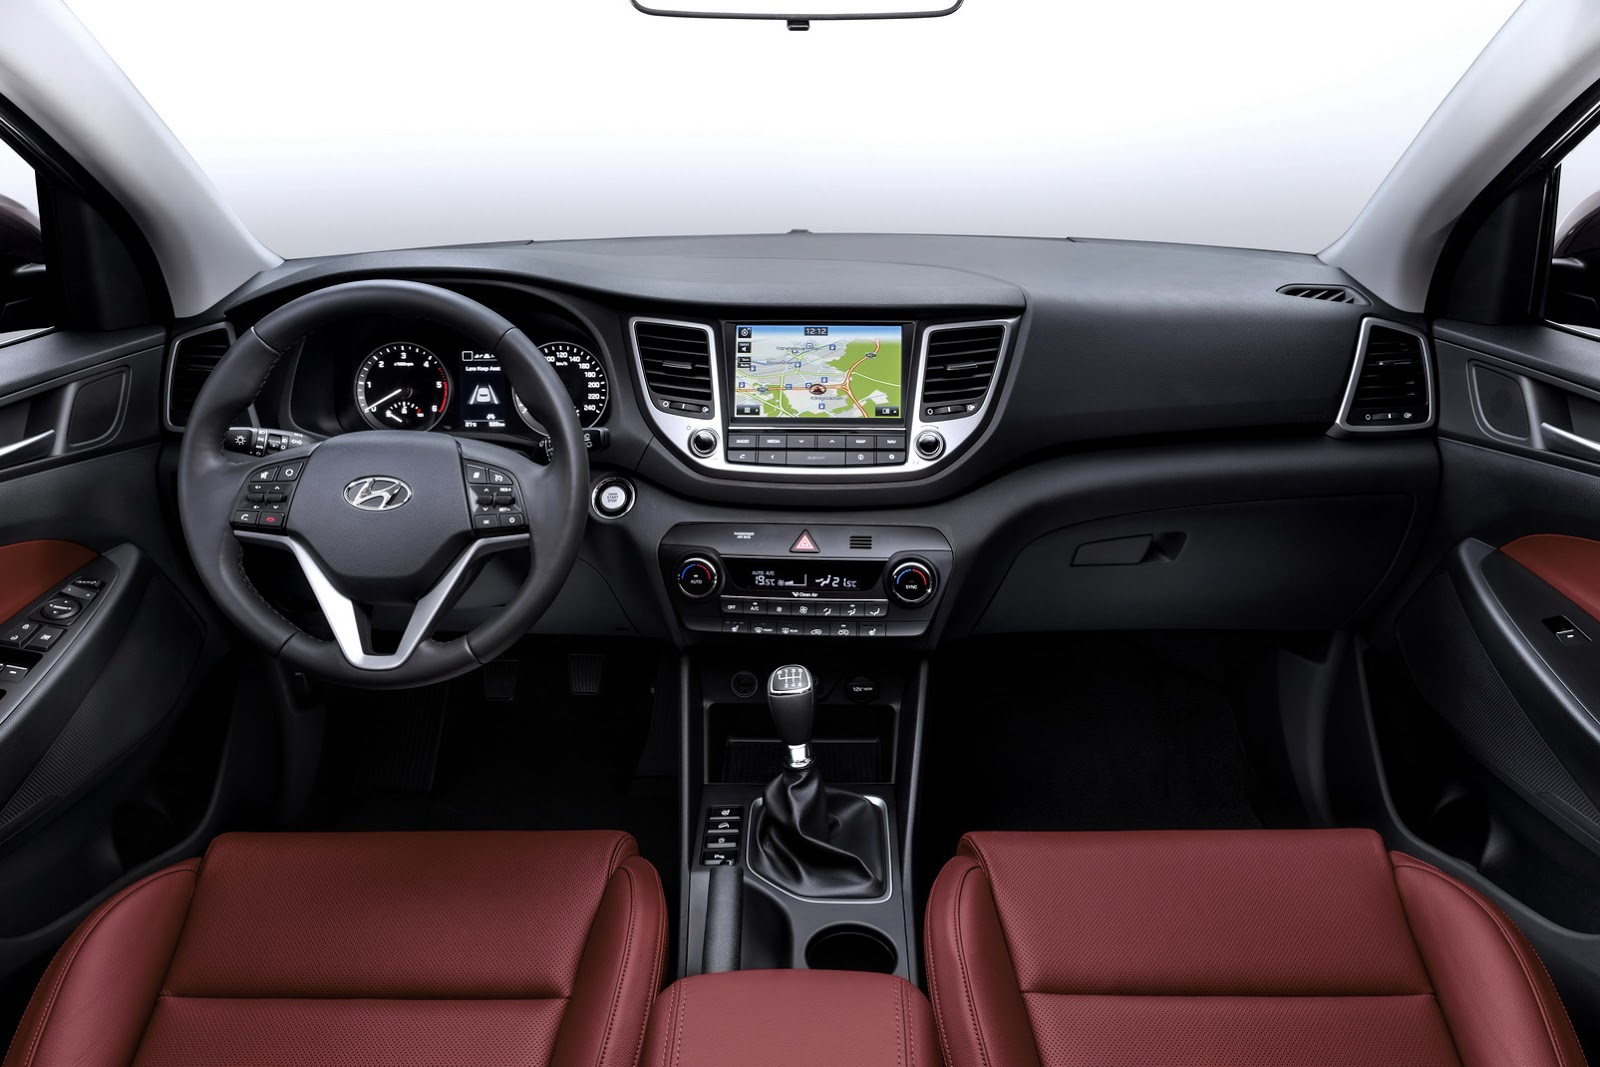 Compact Hyundai va Avea de